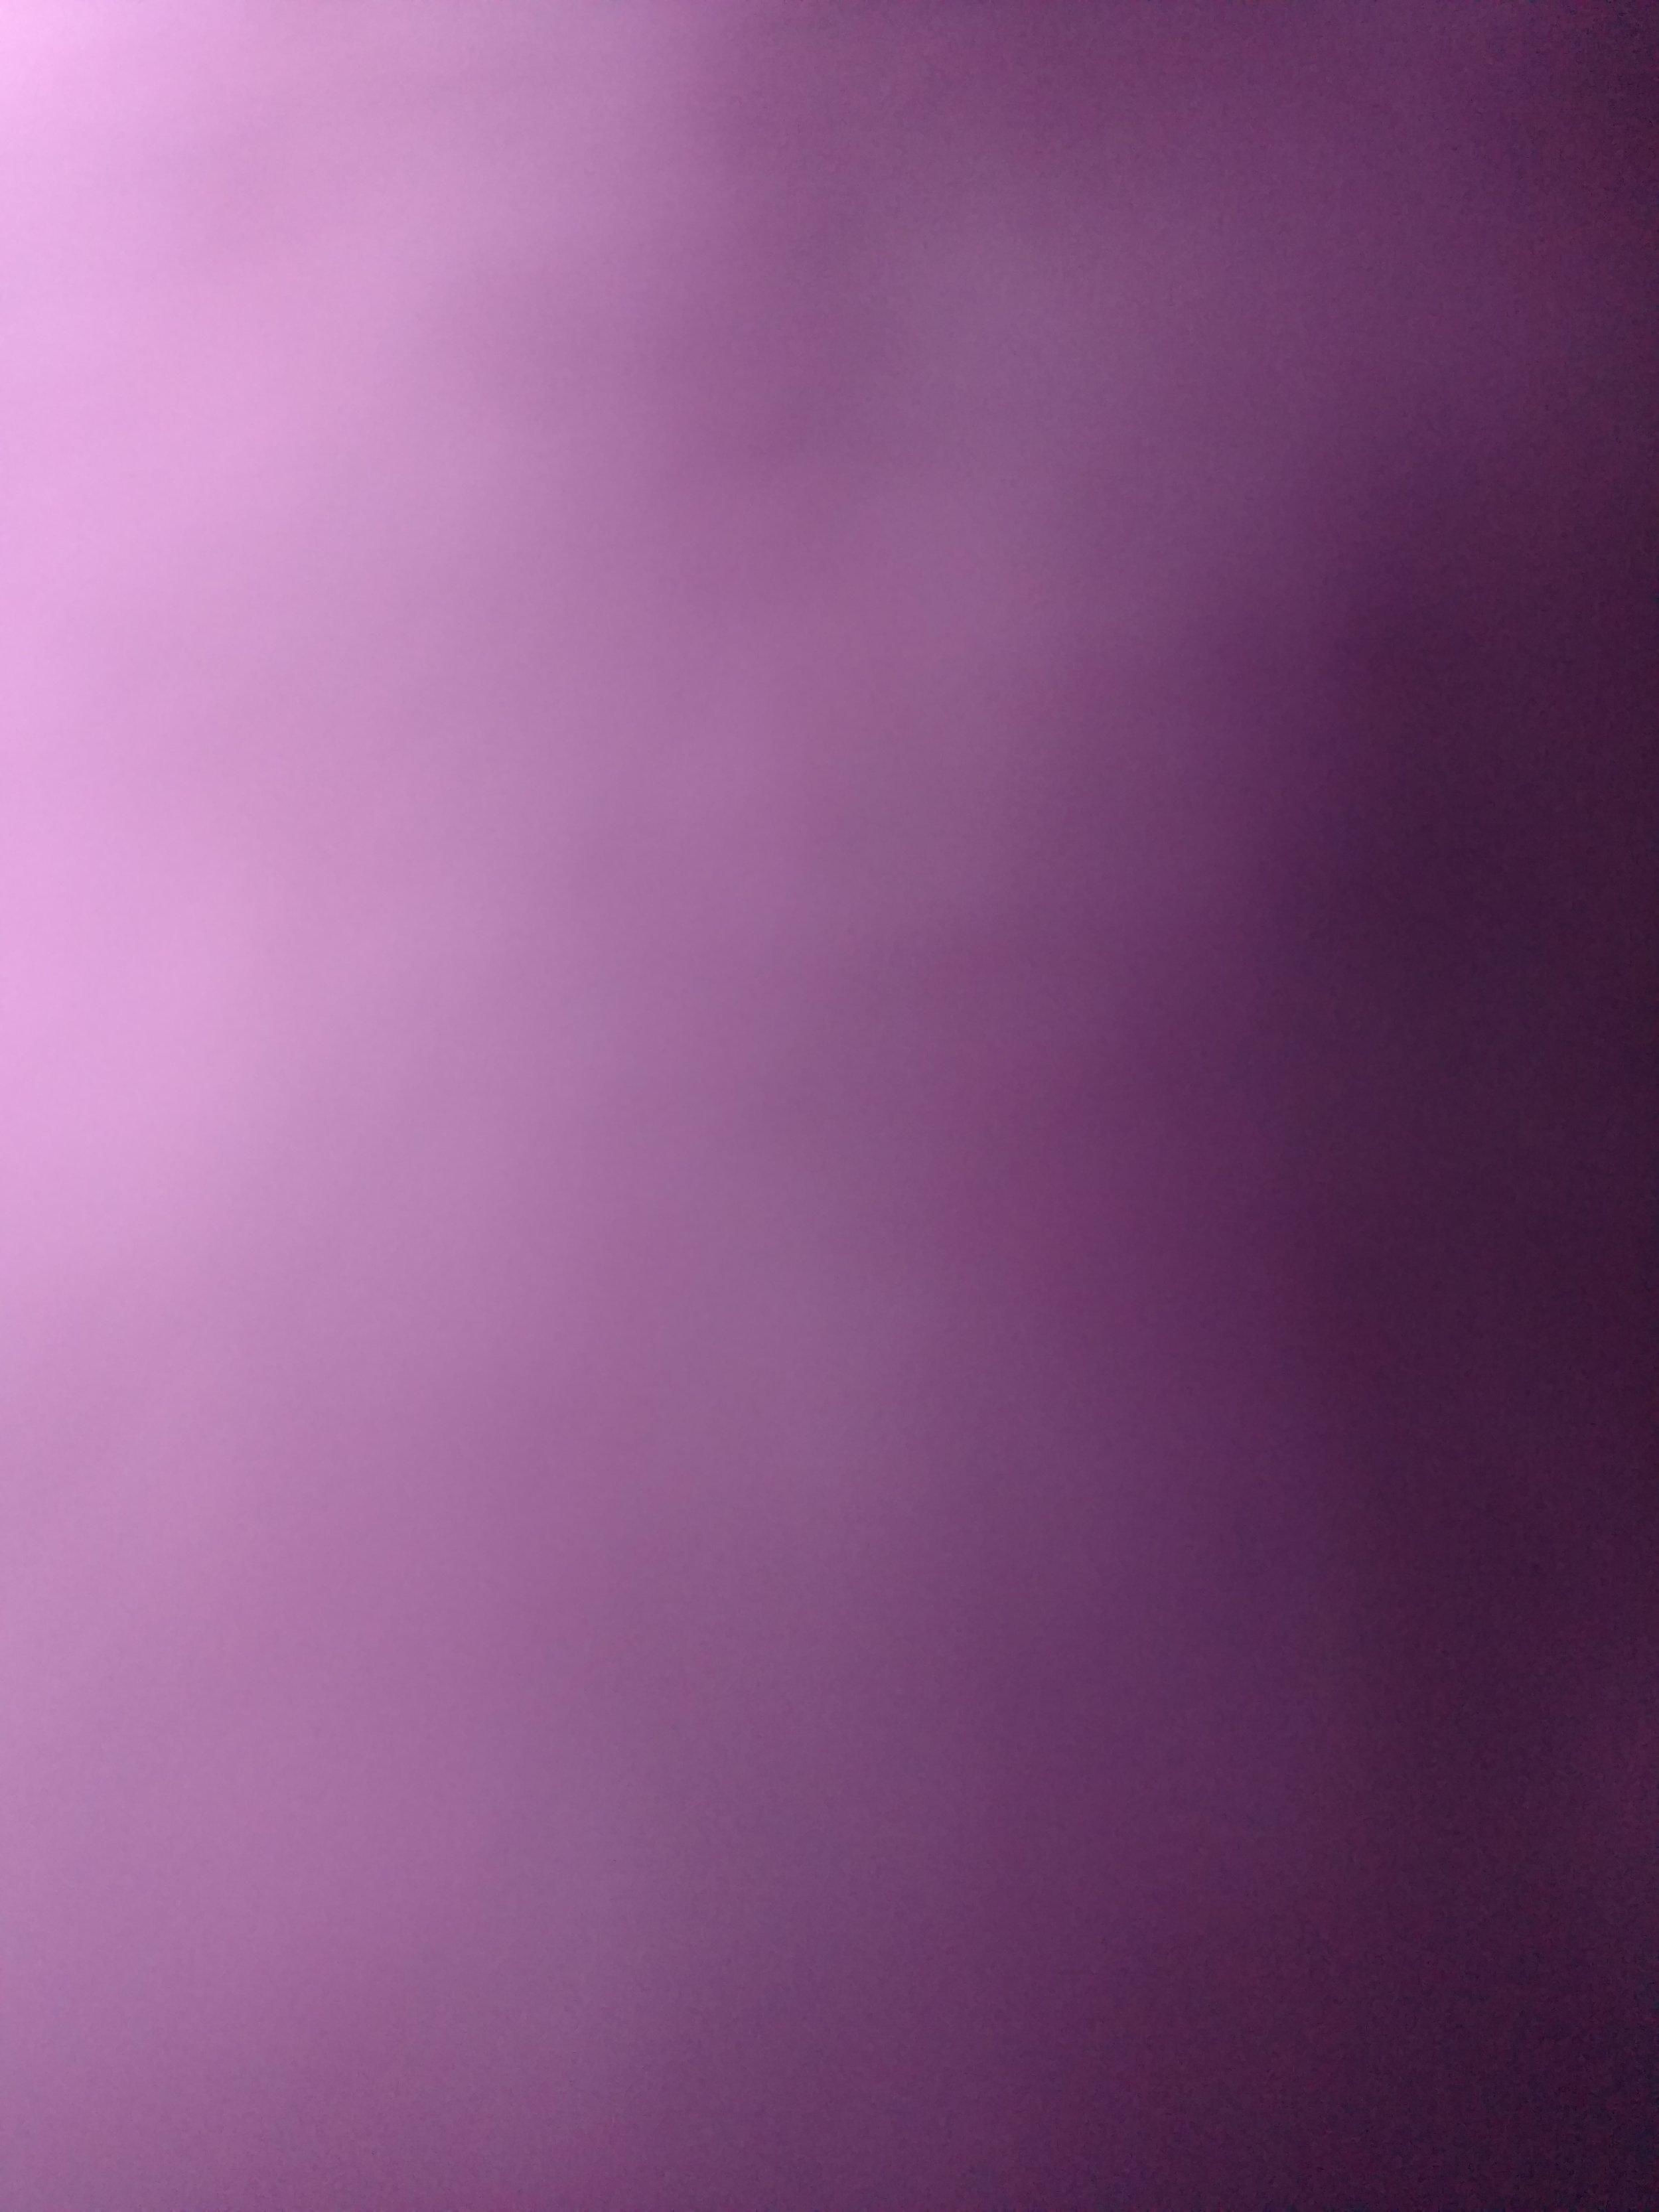 willroth-co-free-texture-gradient-087.jpg